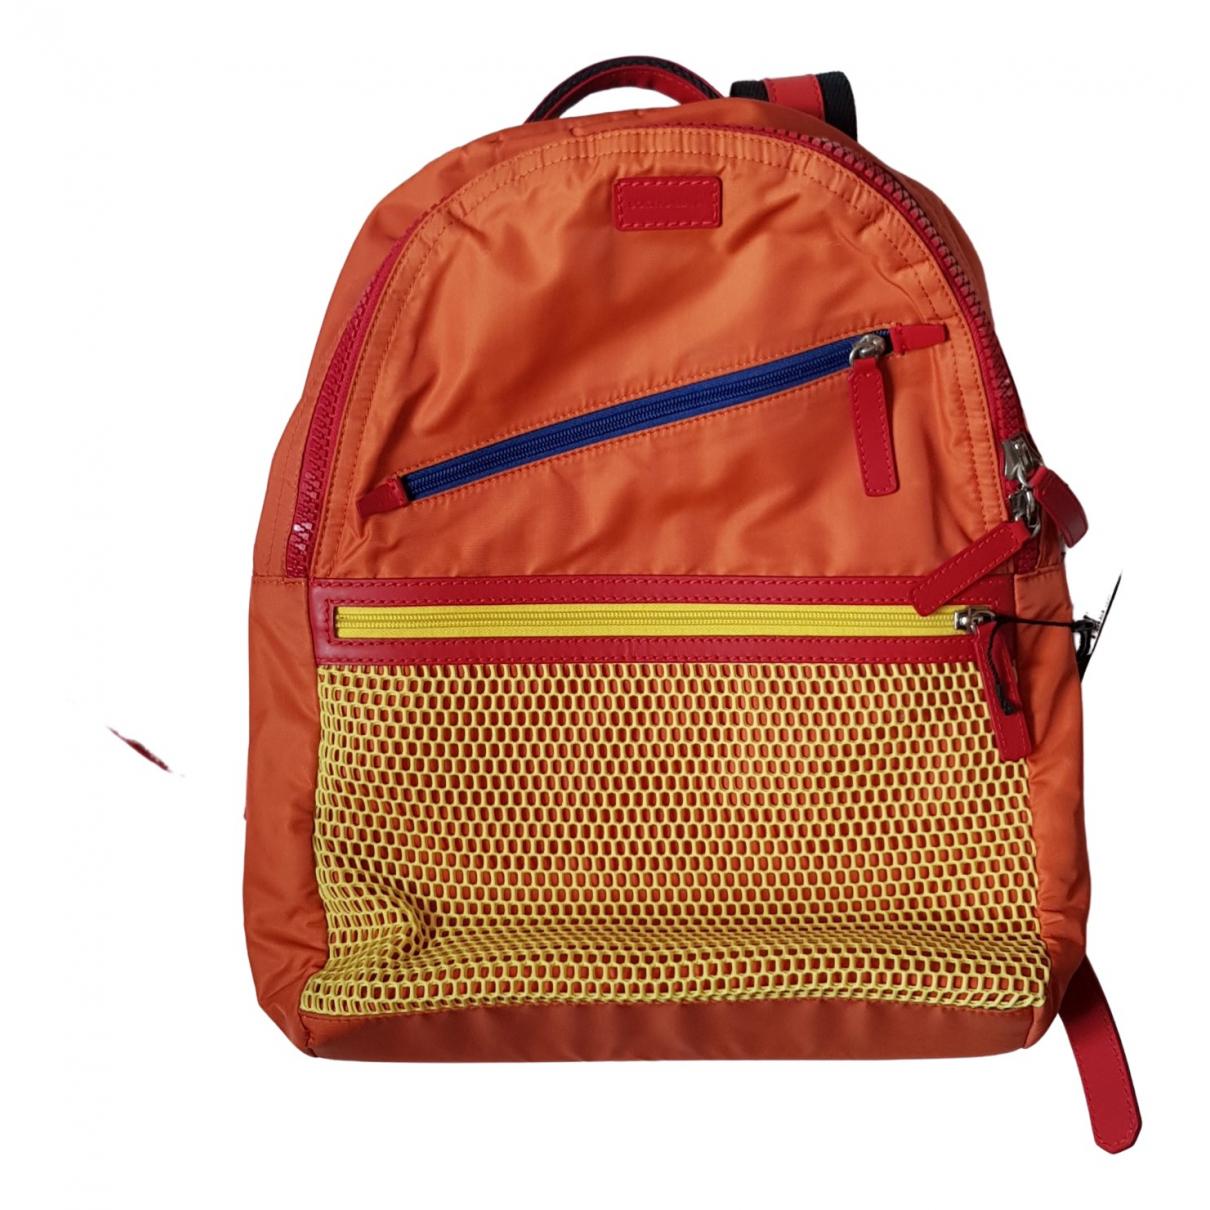 Dolce & Gabbana \N Orange bag for Men \N